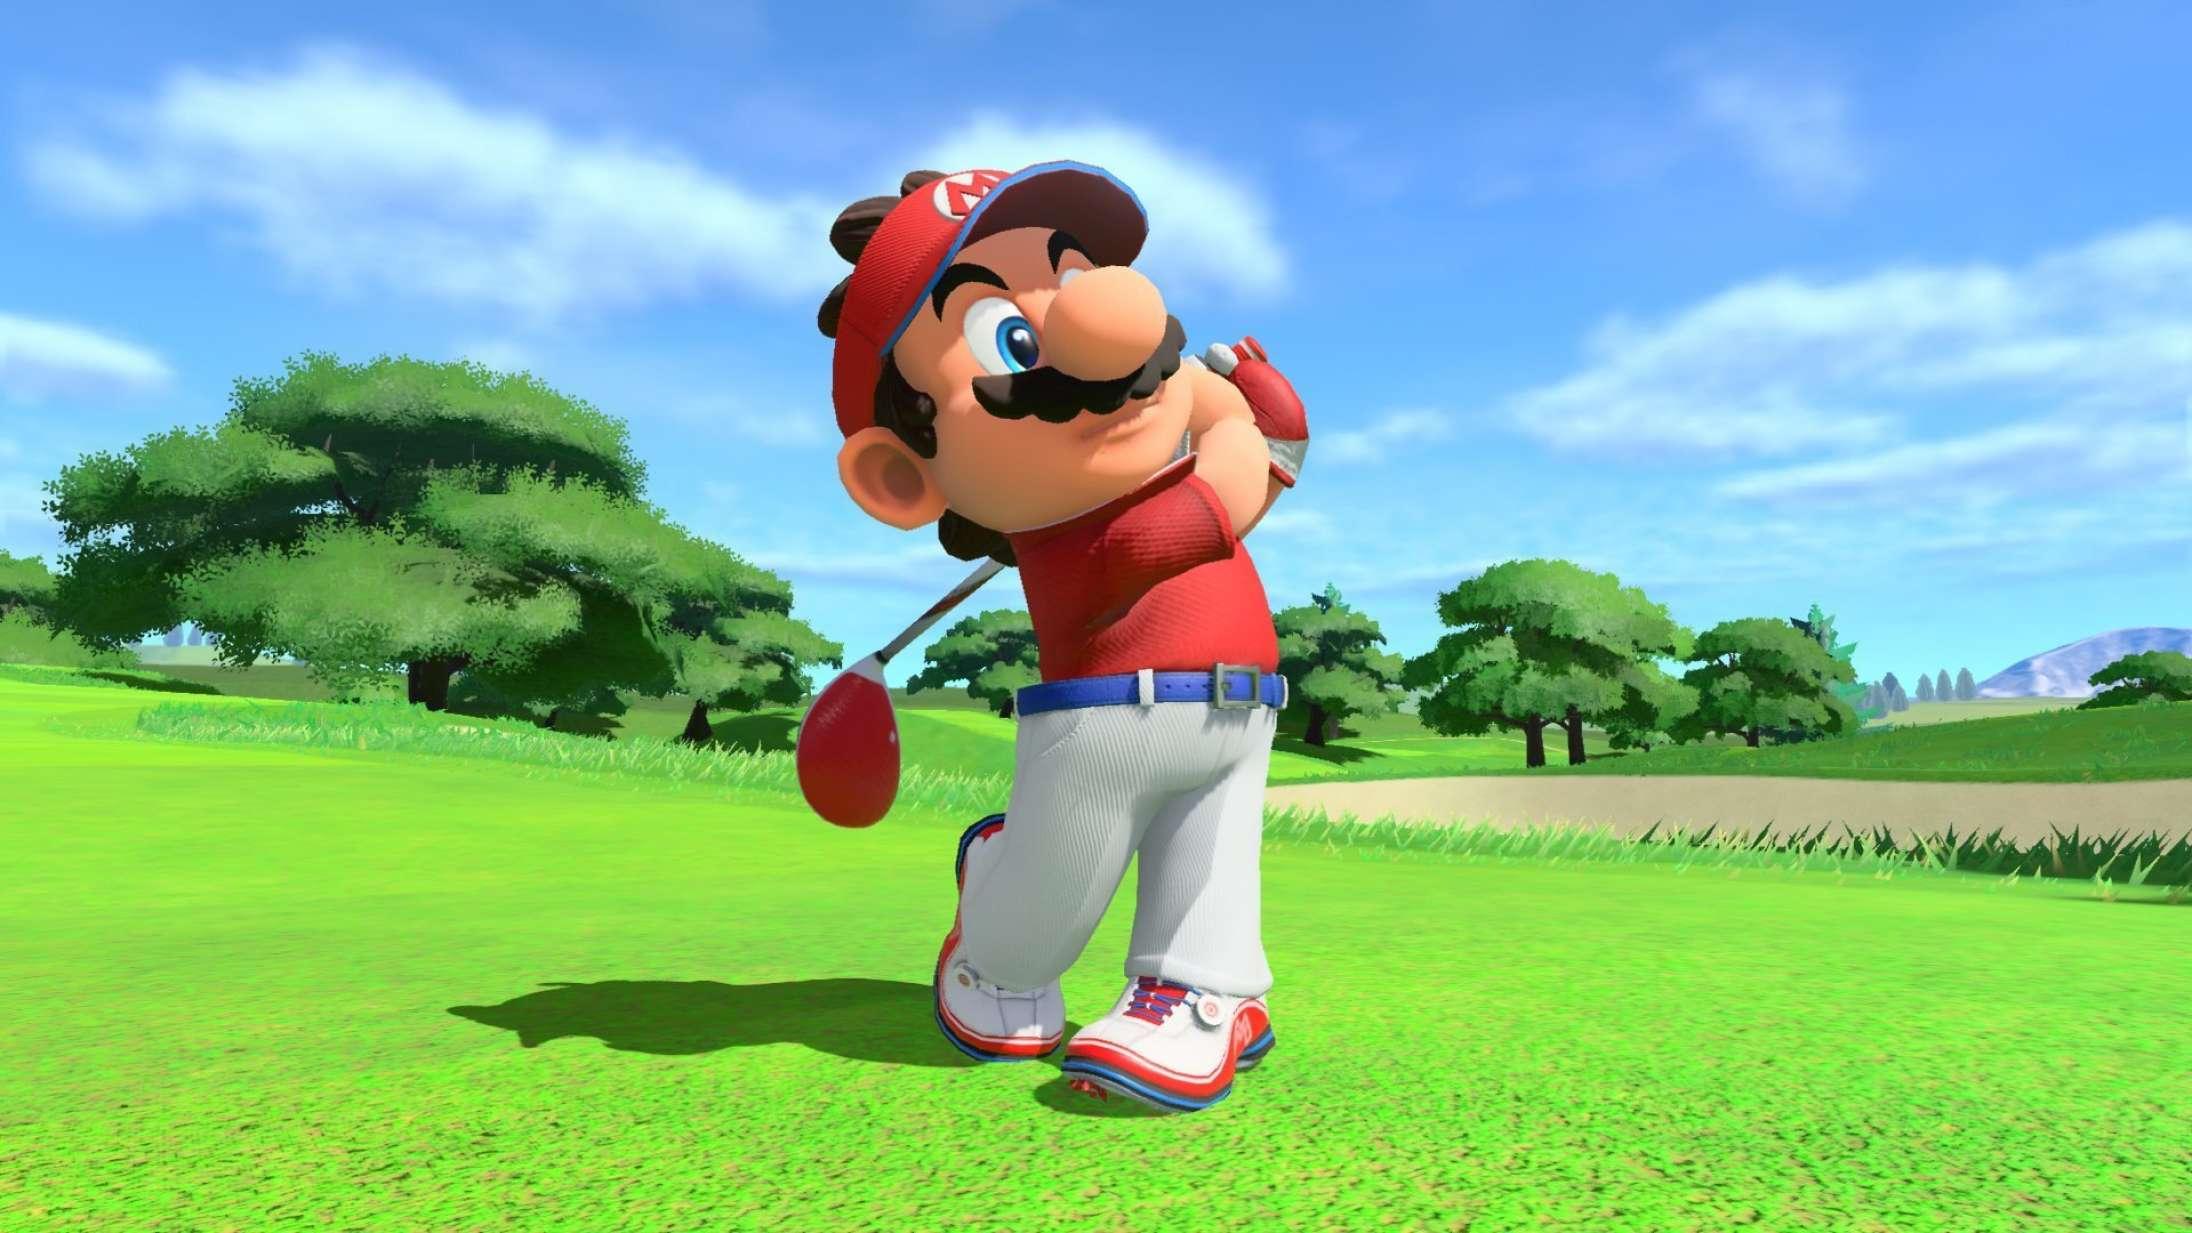 Nintendo scorer flere bogeys end birdies med 'Mario Golf: Super Rush'